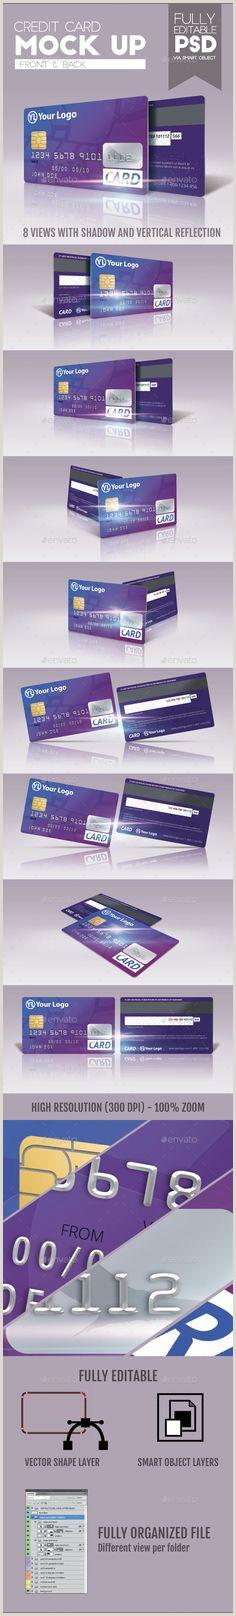 Best Business Cards Redit Credit Card Designs 40 Ideas On Pinterest